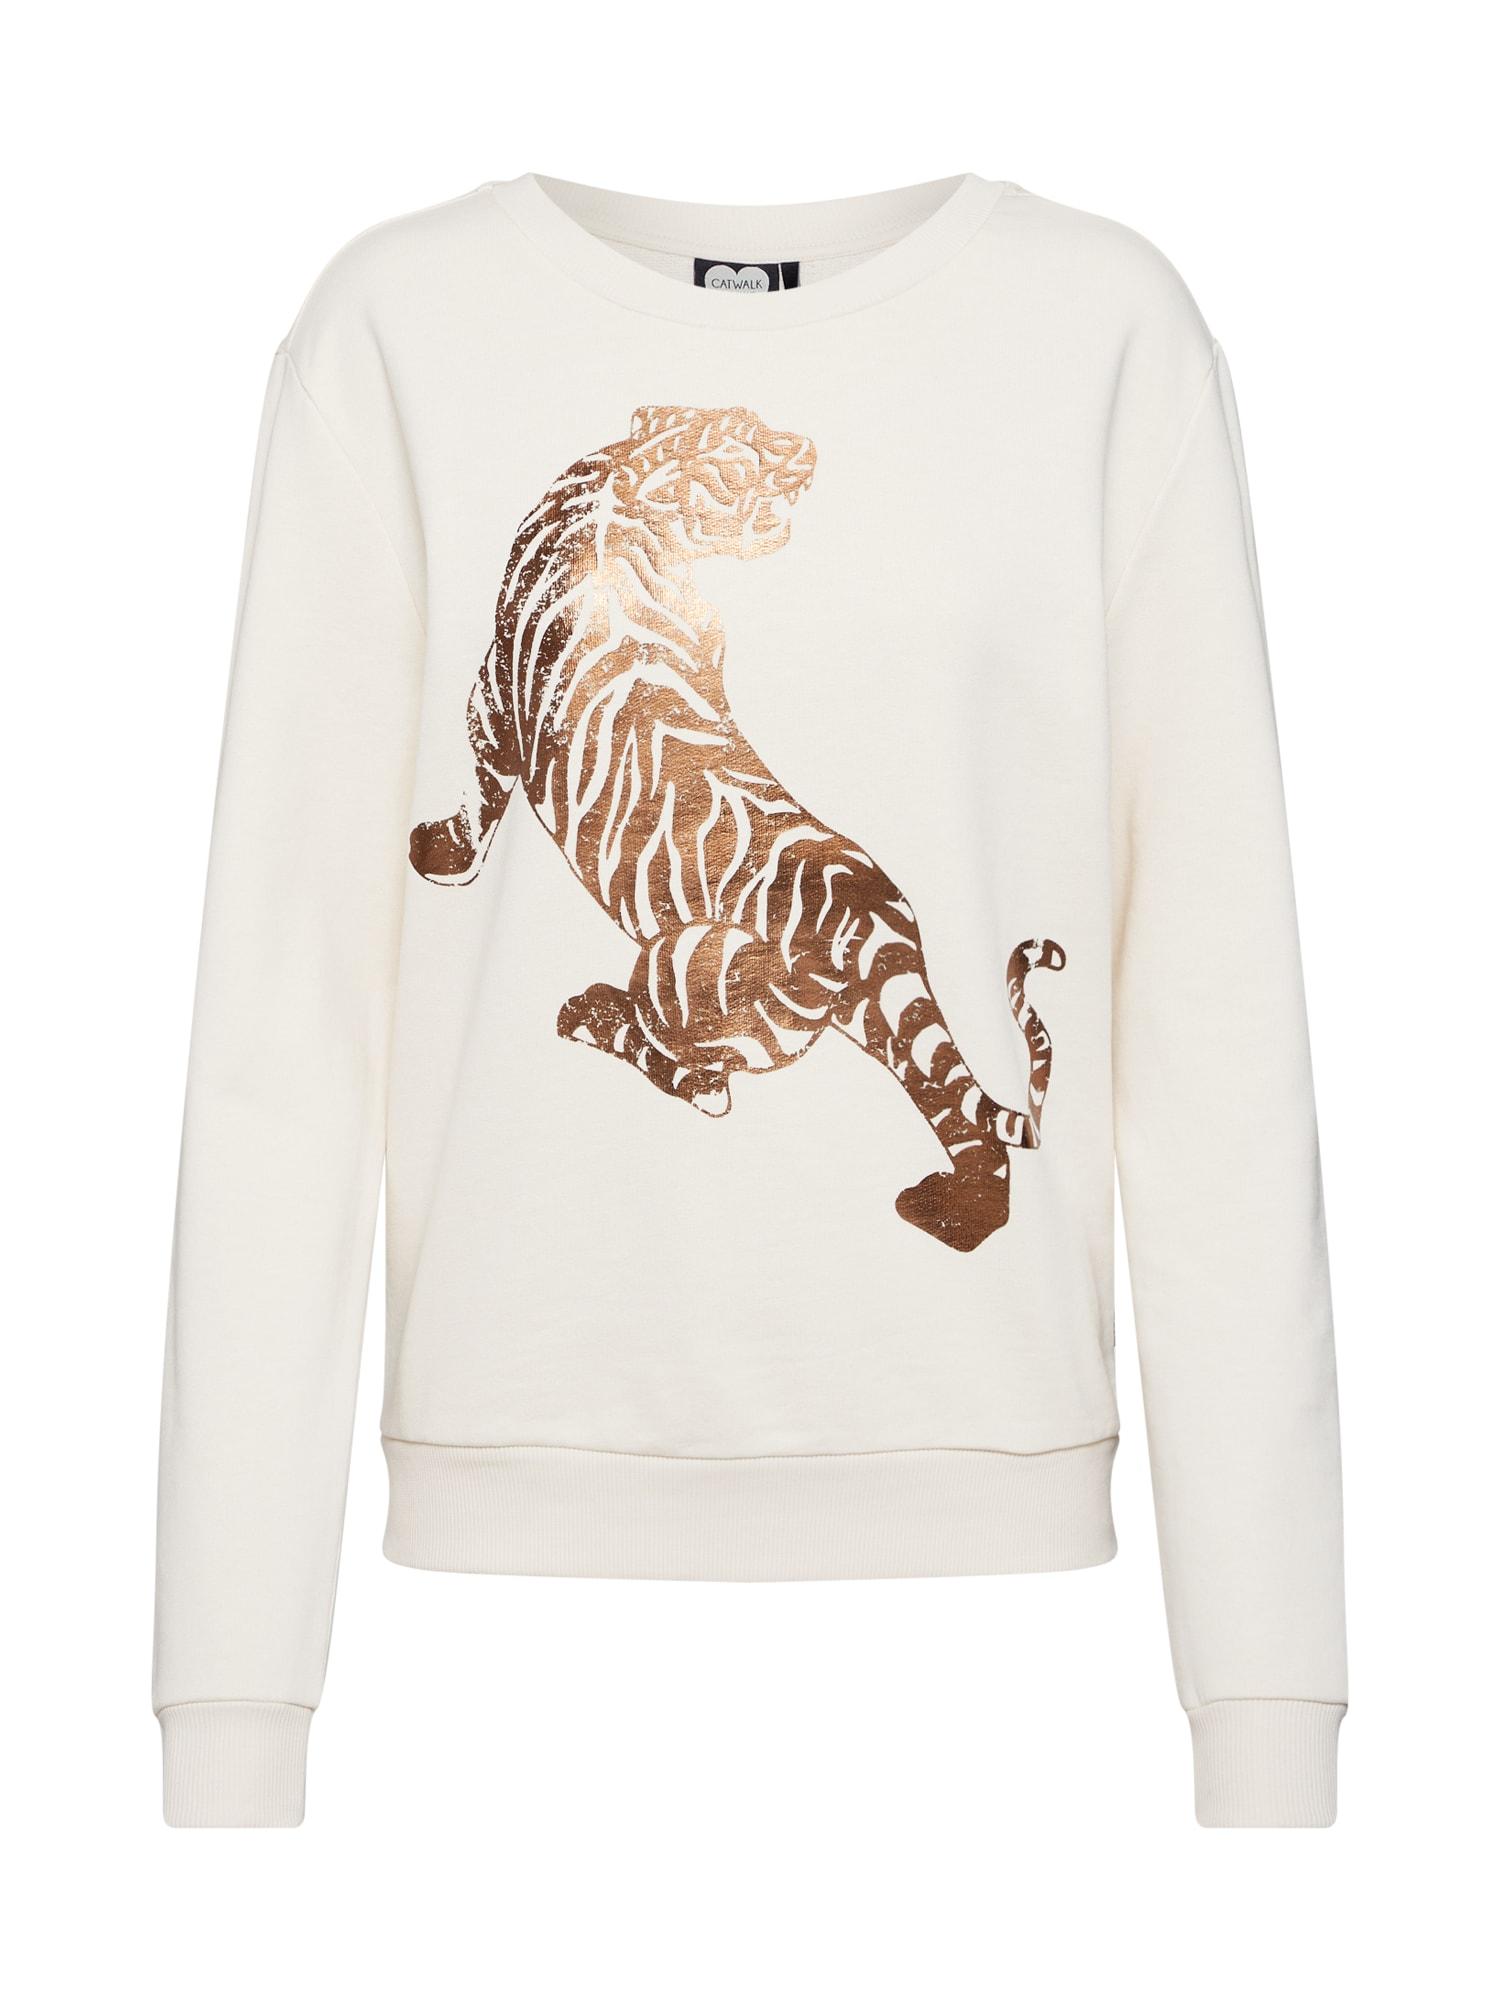 CATWALK JUNKIE Megztinis be užsegimo 'SW White Tiger' balkšva